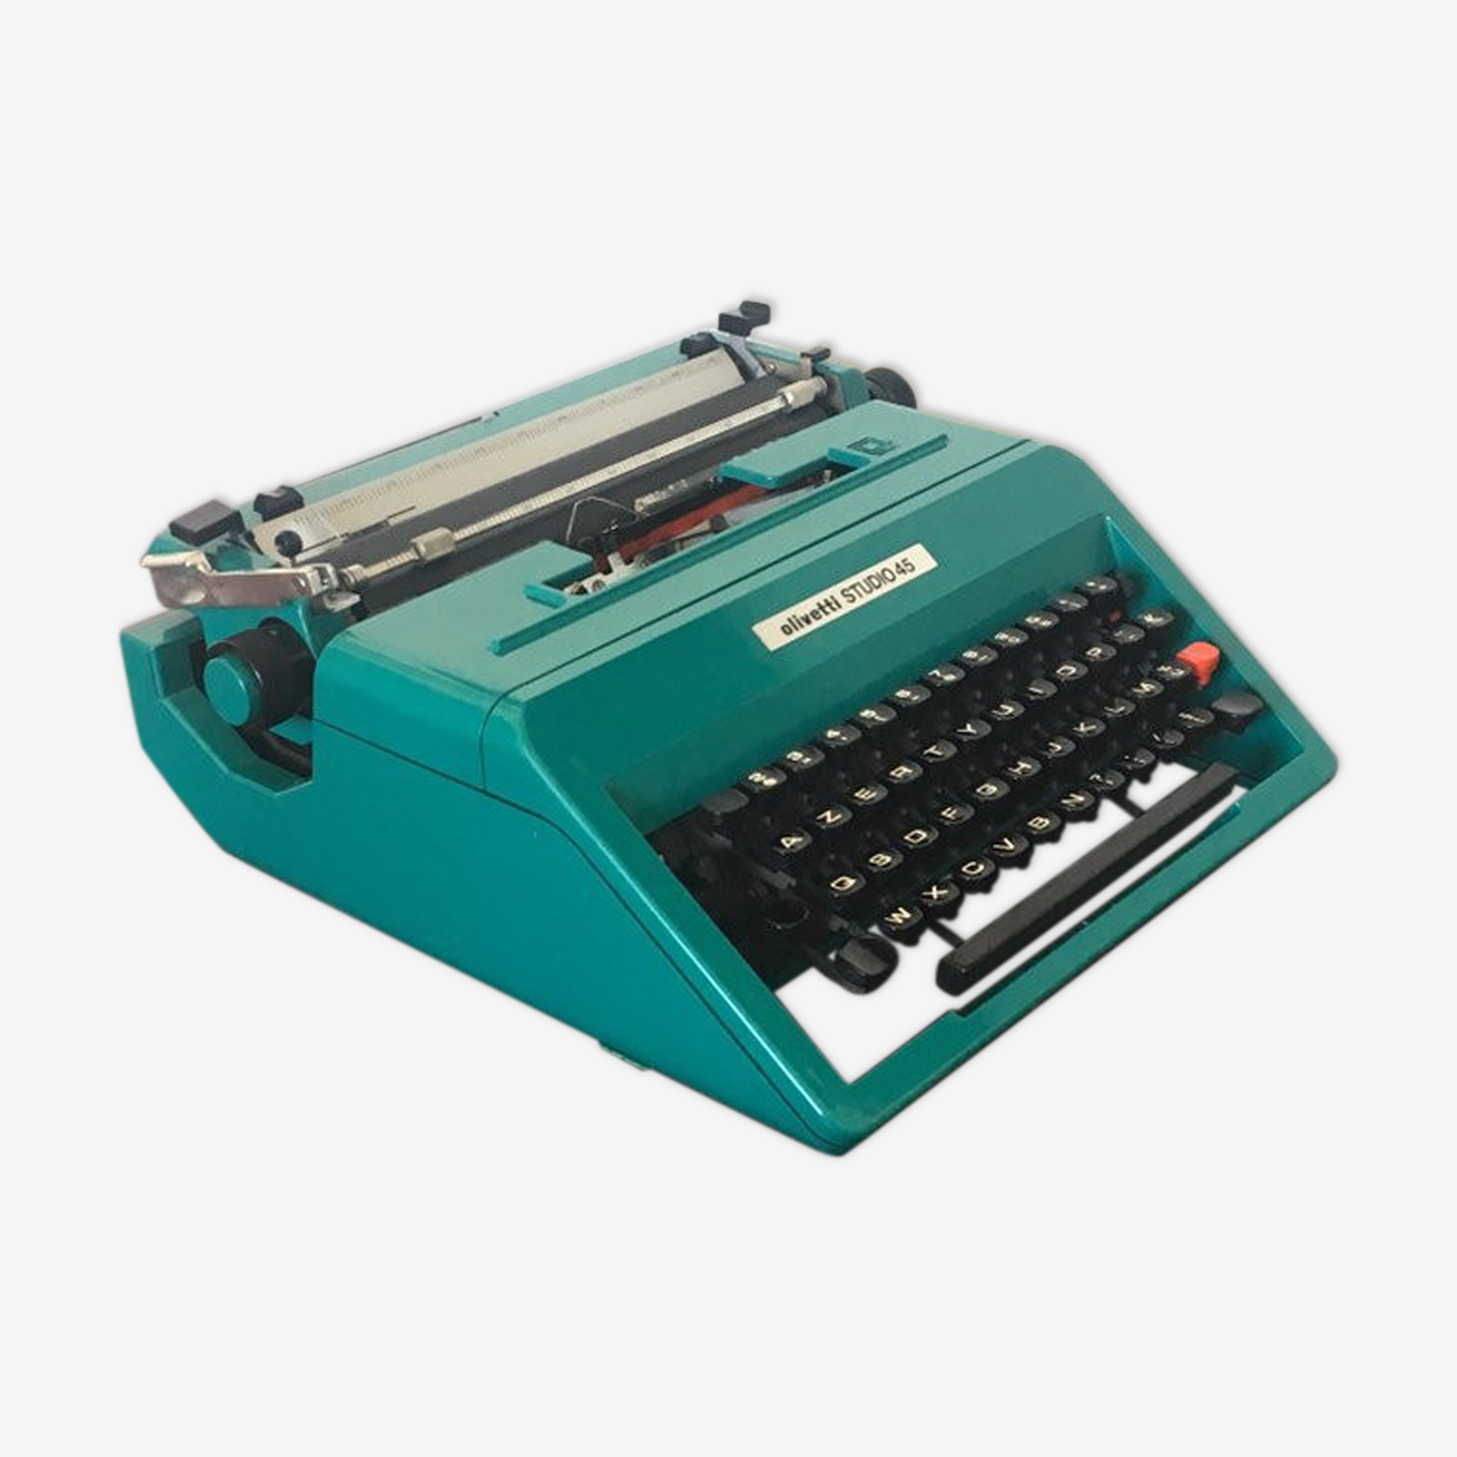 Studio 45 blue duck Olivetti typewriter